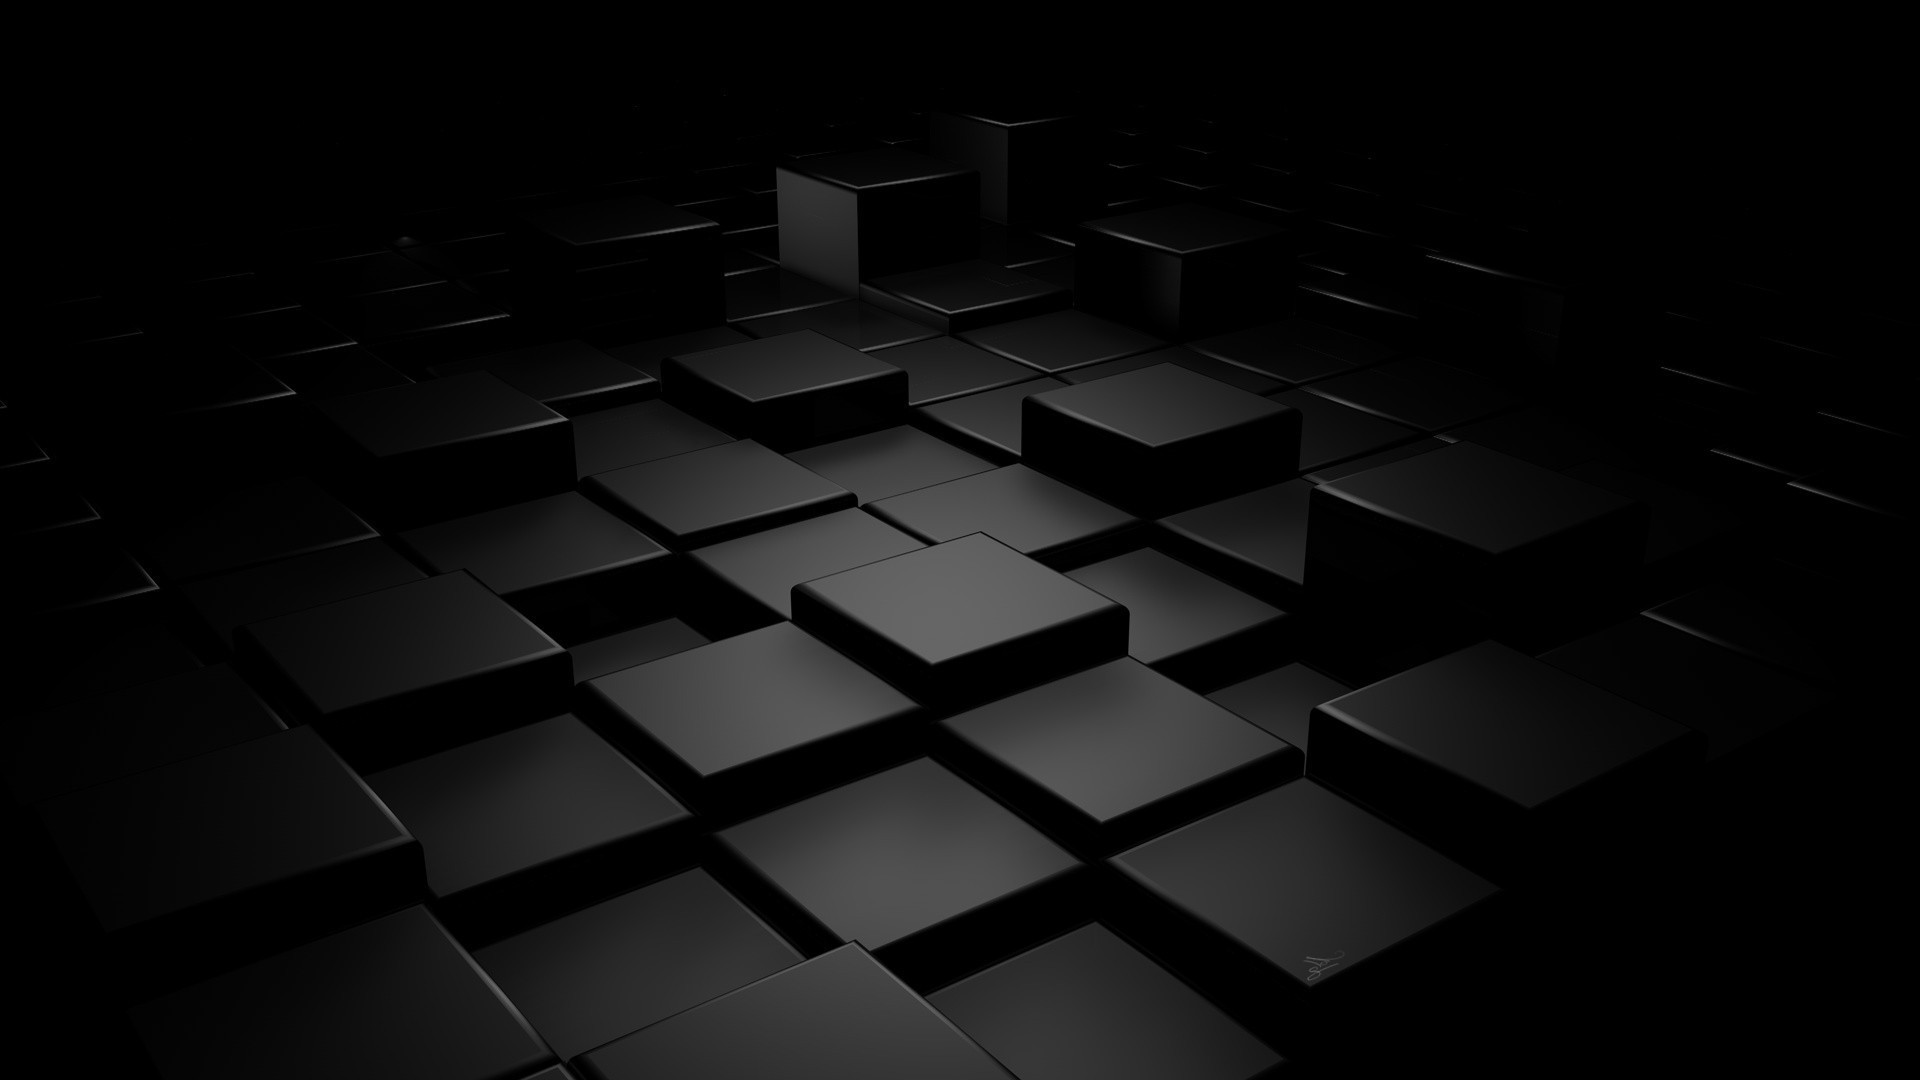 74 Black Computer Background On Wallpapersafari